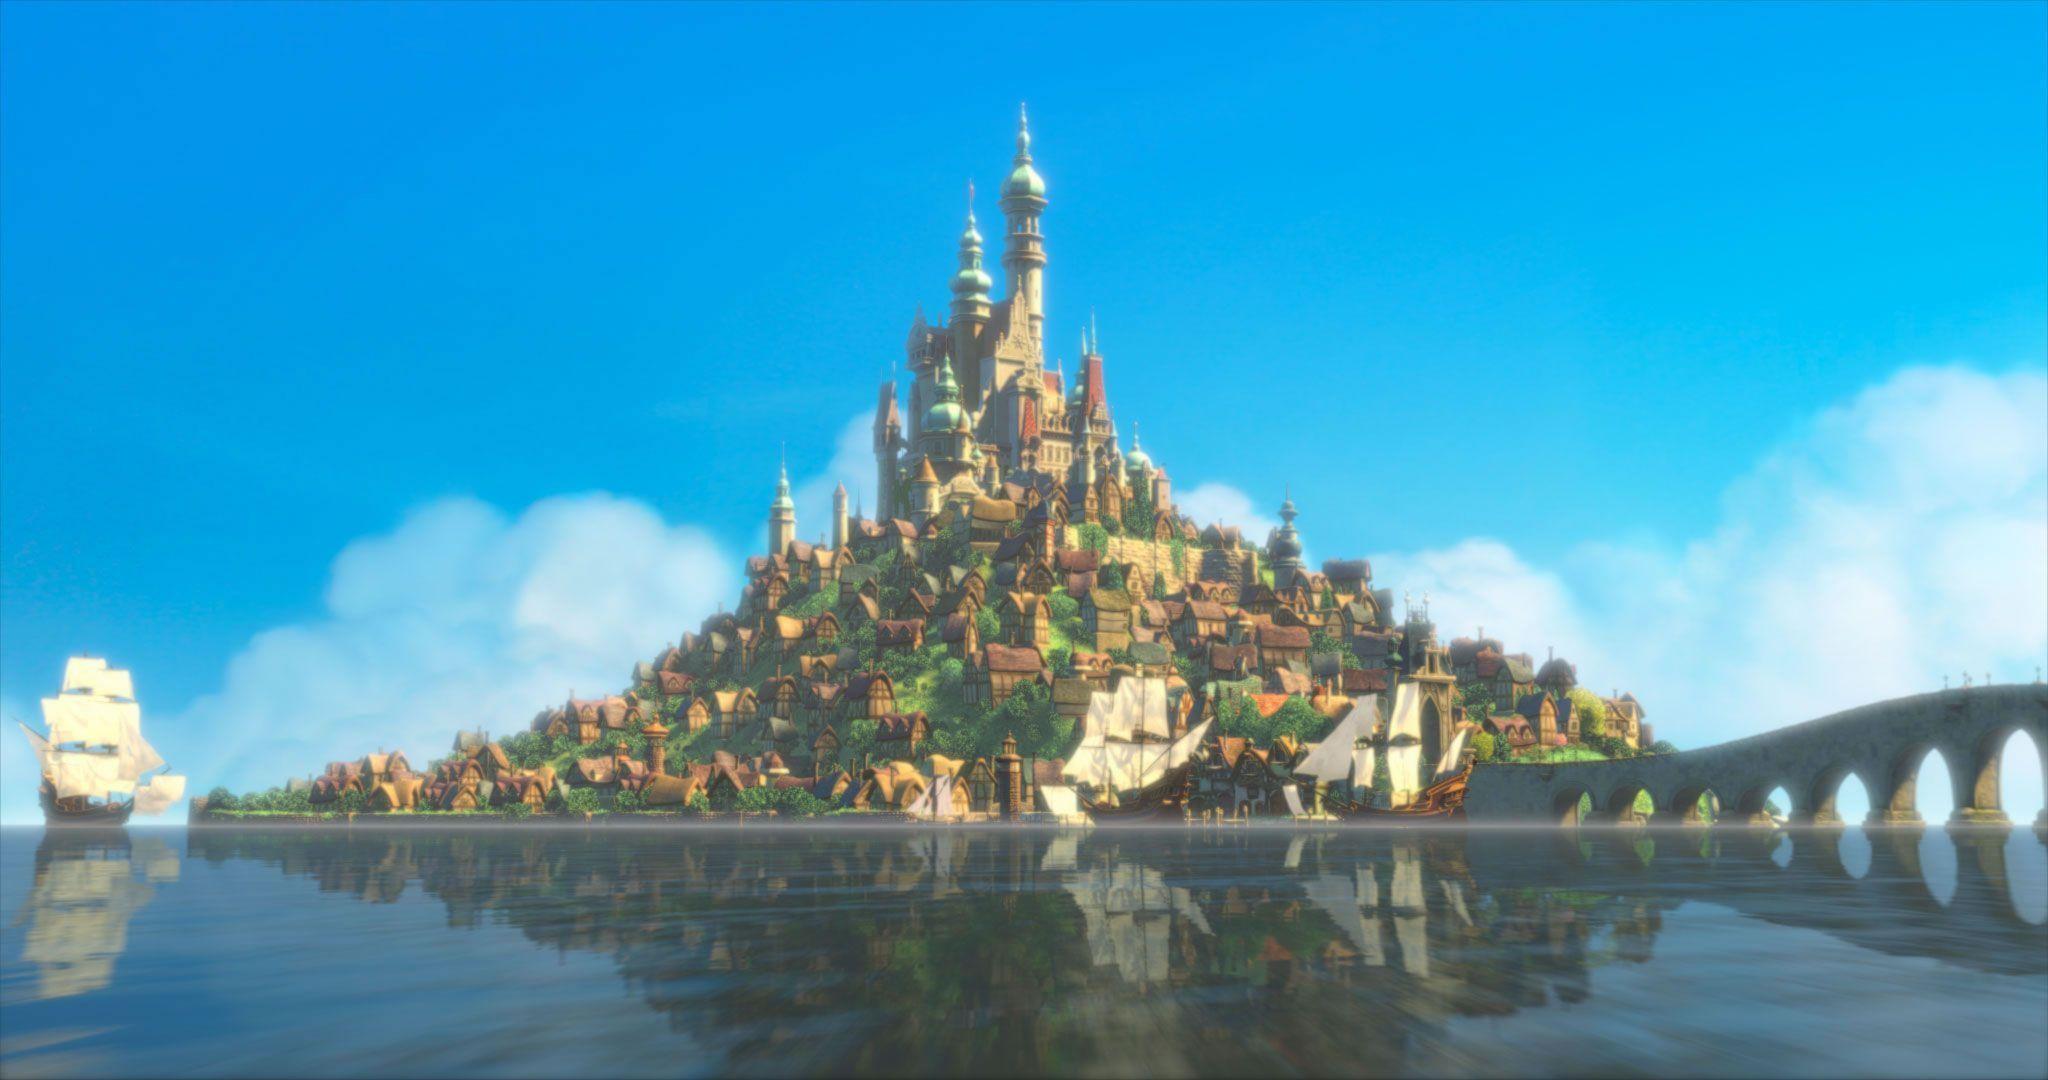 Rapunzel's Castle from Disney's Tangled Desktop Wallpaper